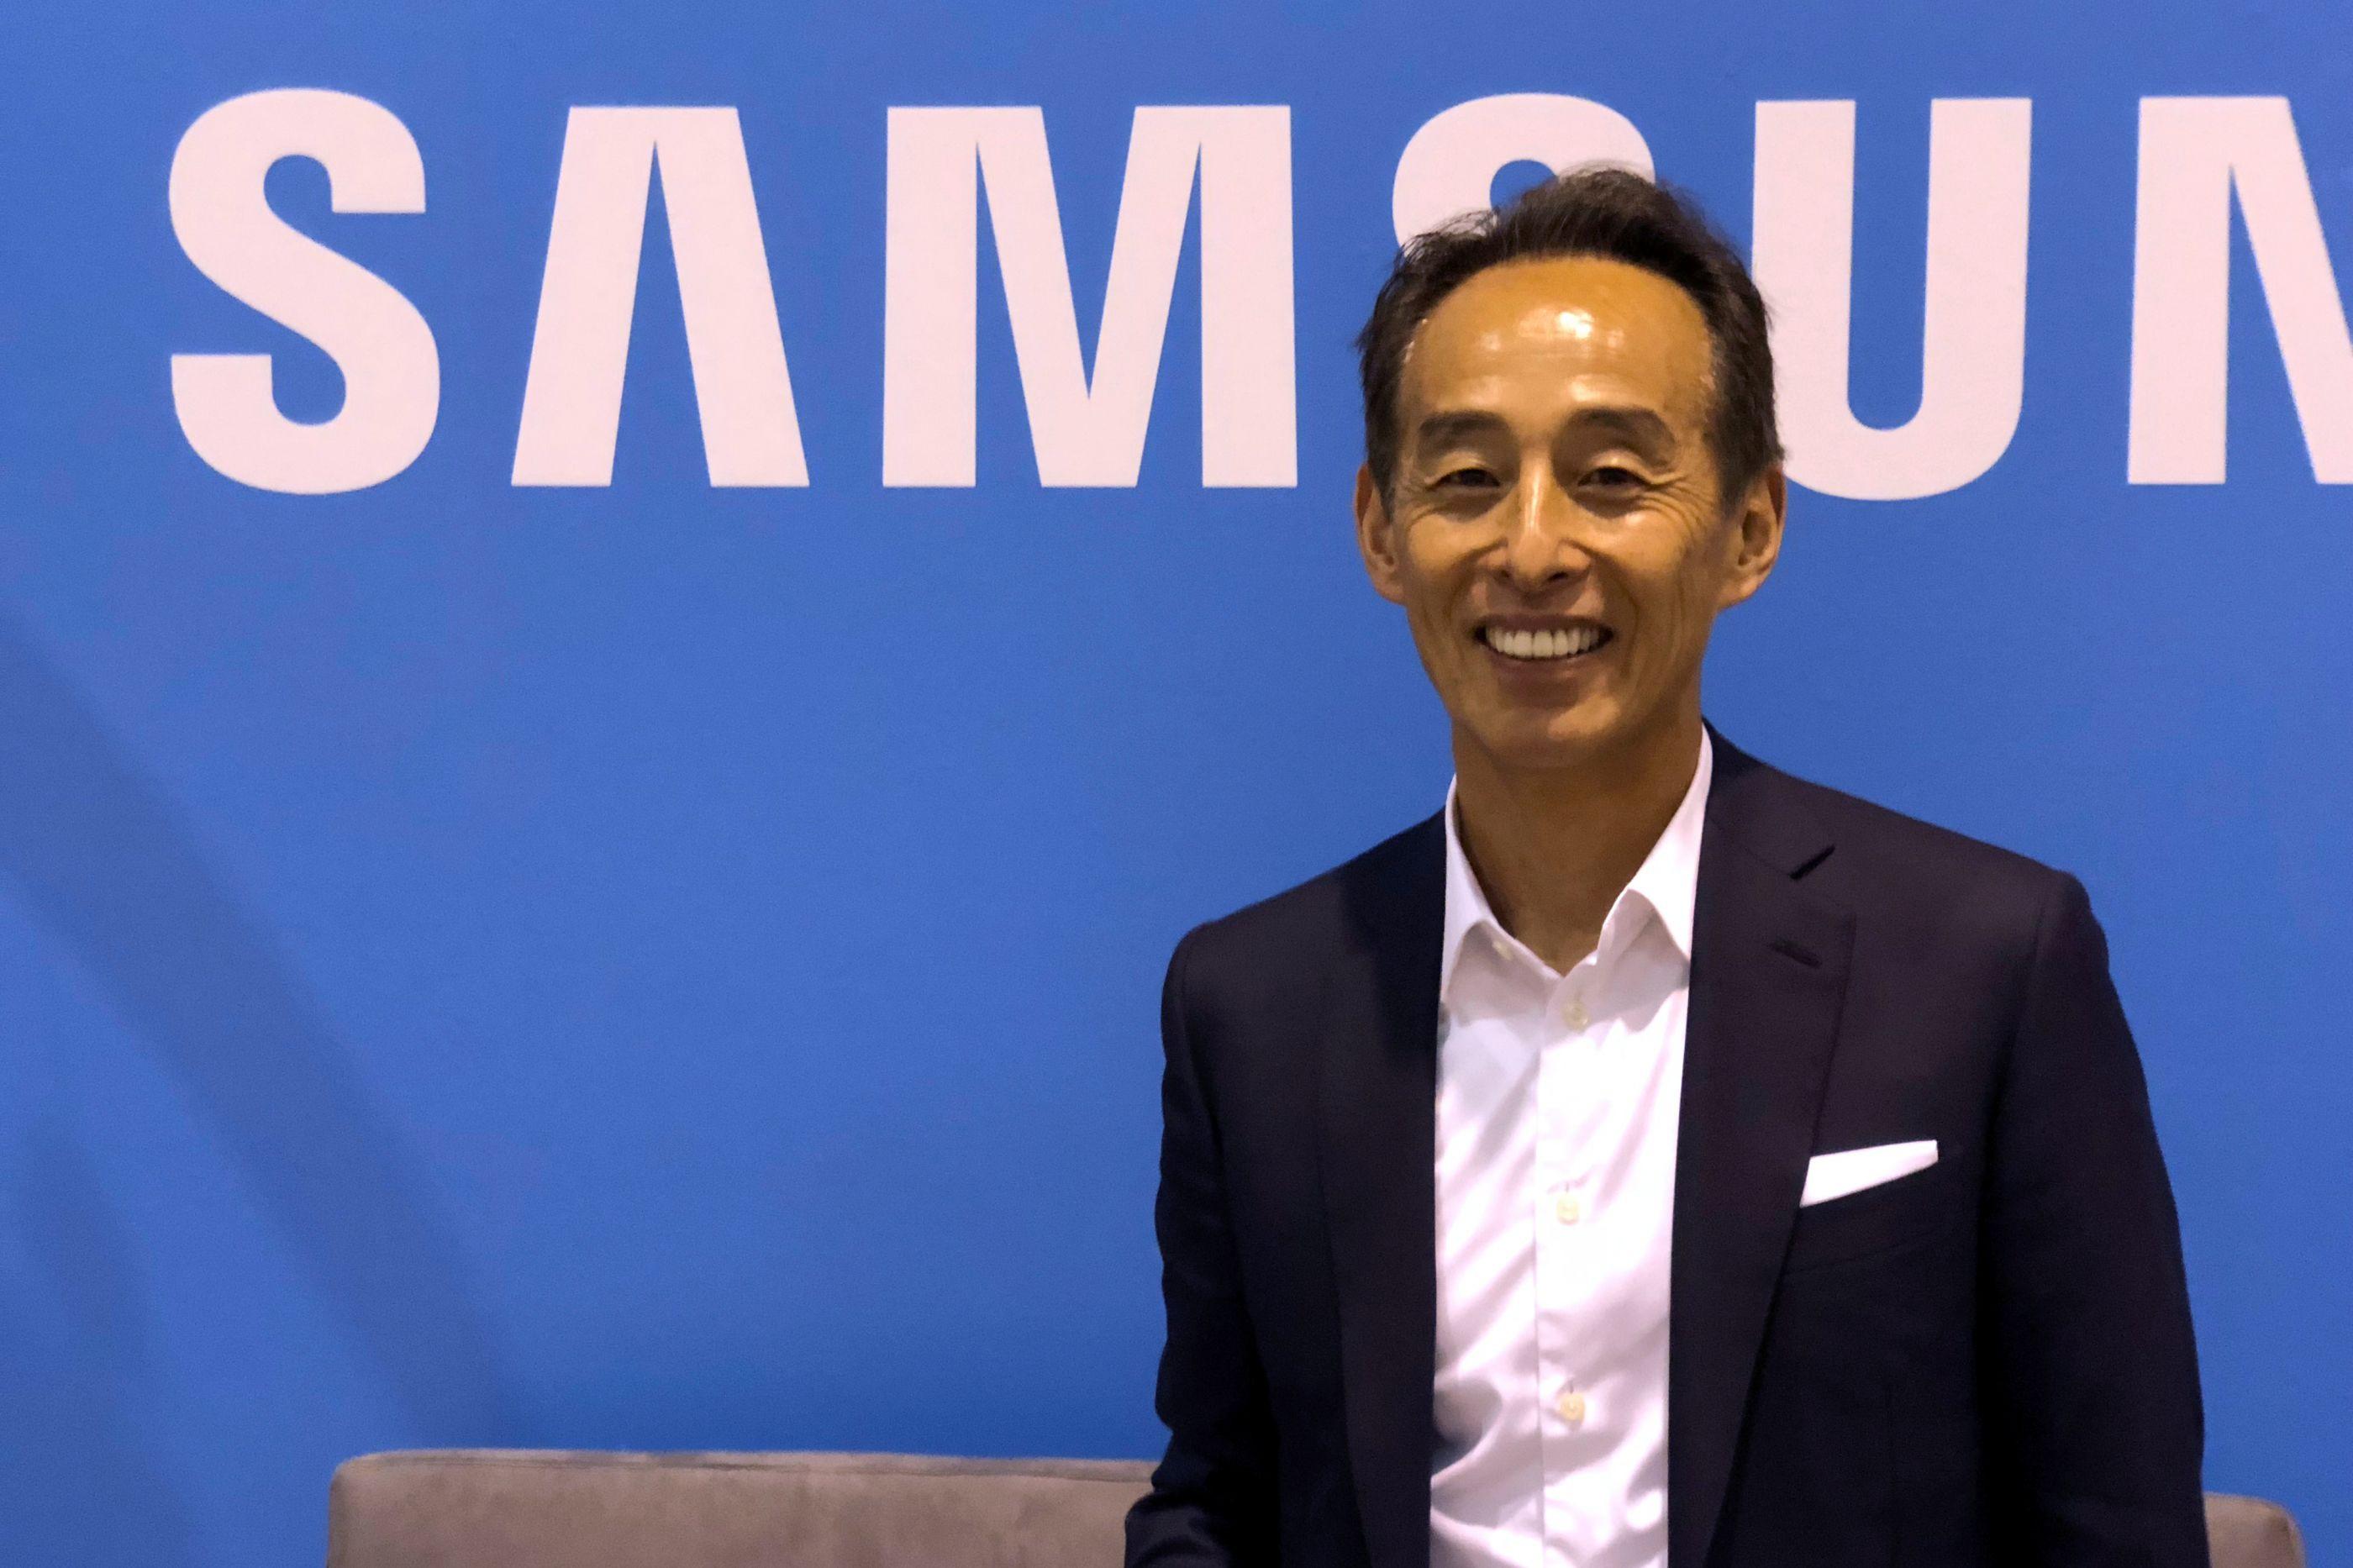 Samsung alerta para perigos de Inteligência Artificial